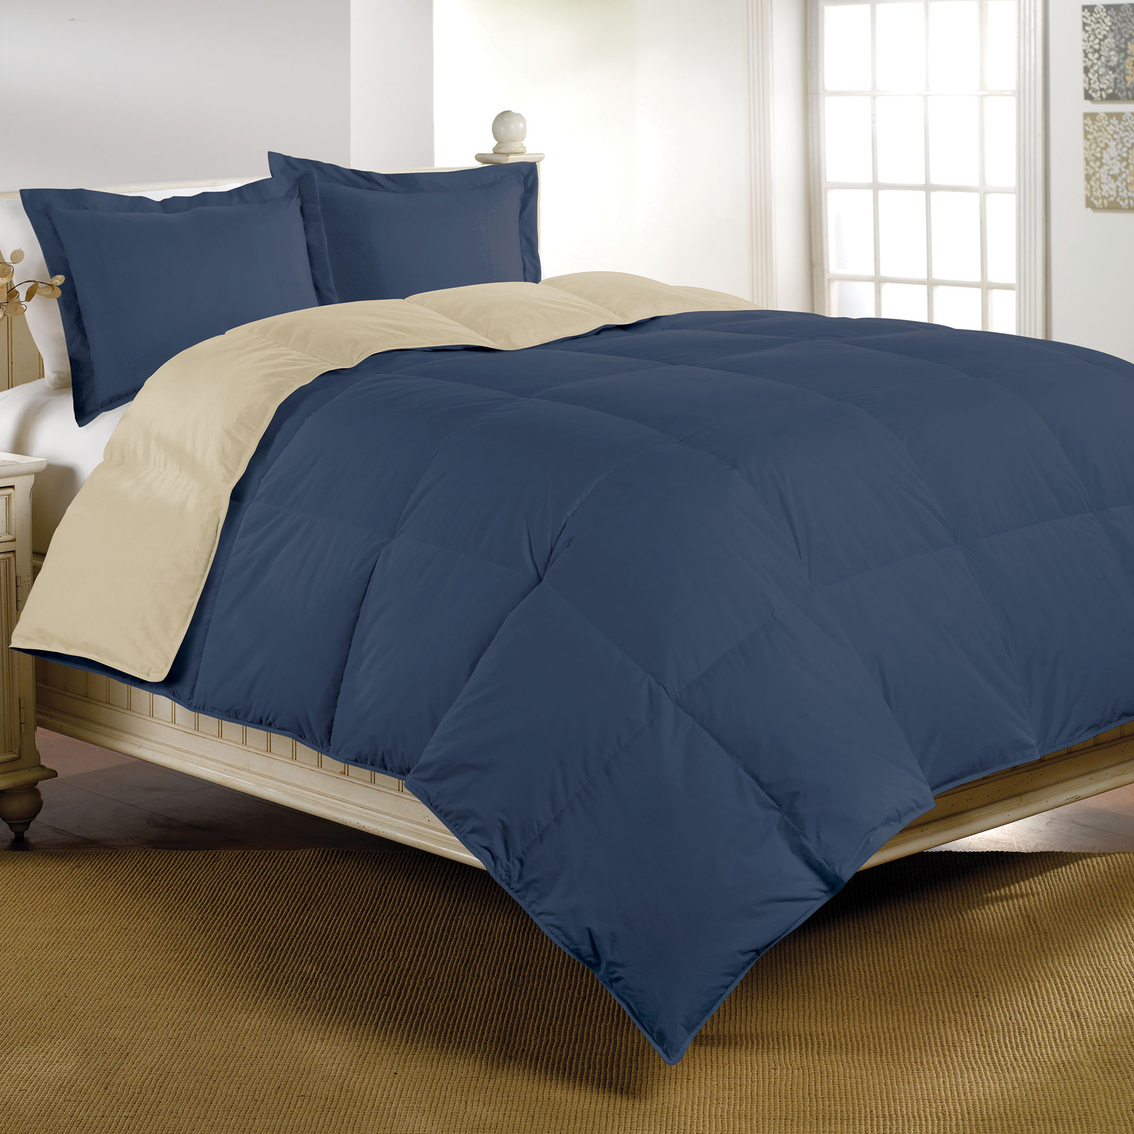 Basic Elements Down Alternative Comforter Bed Bath